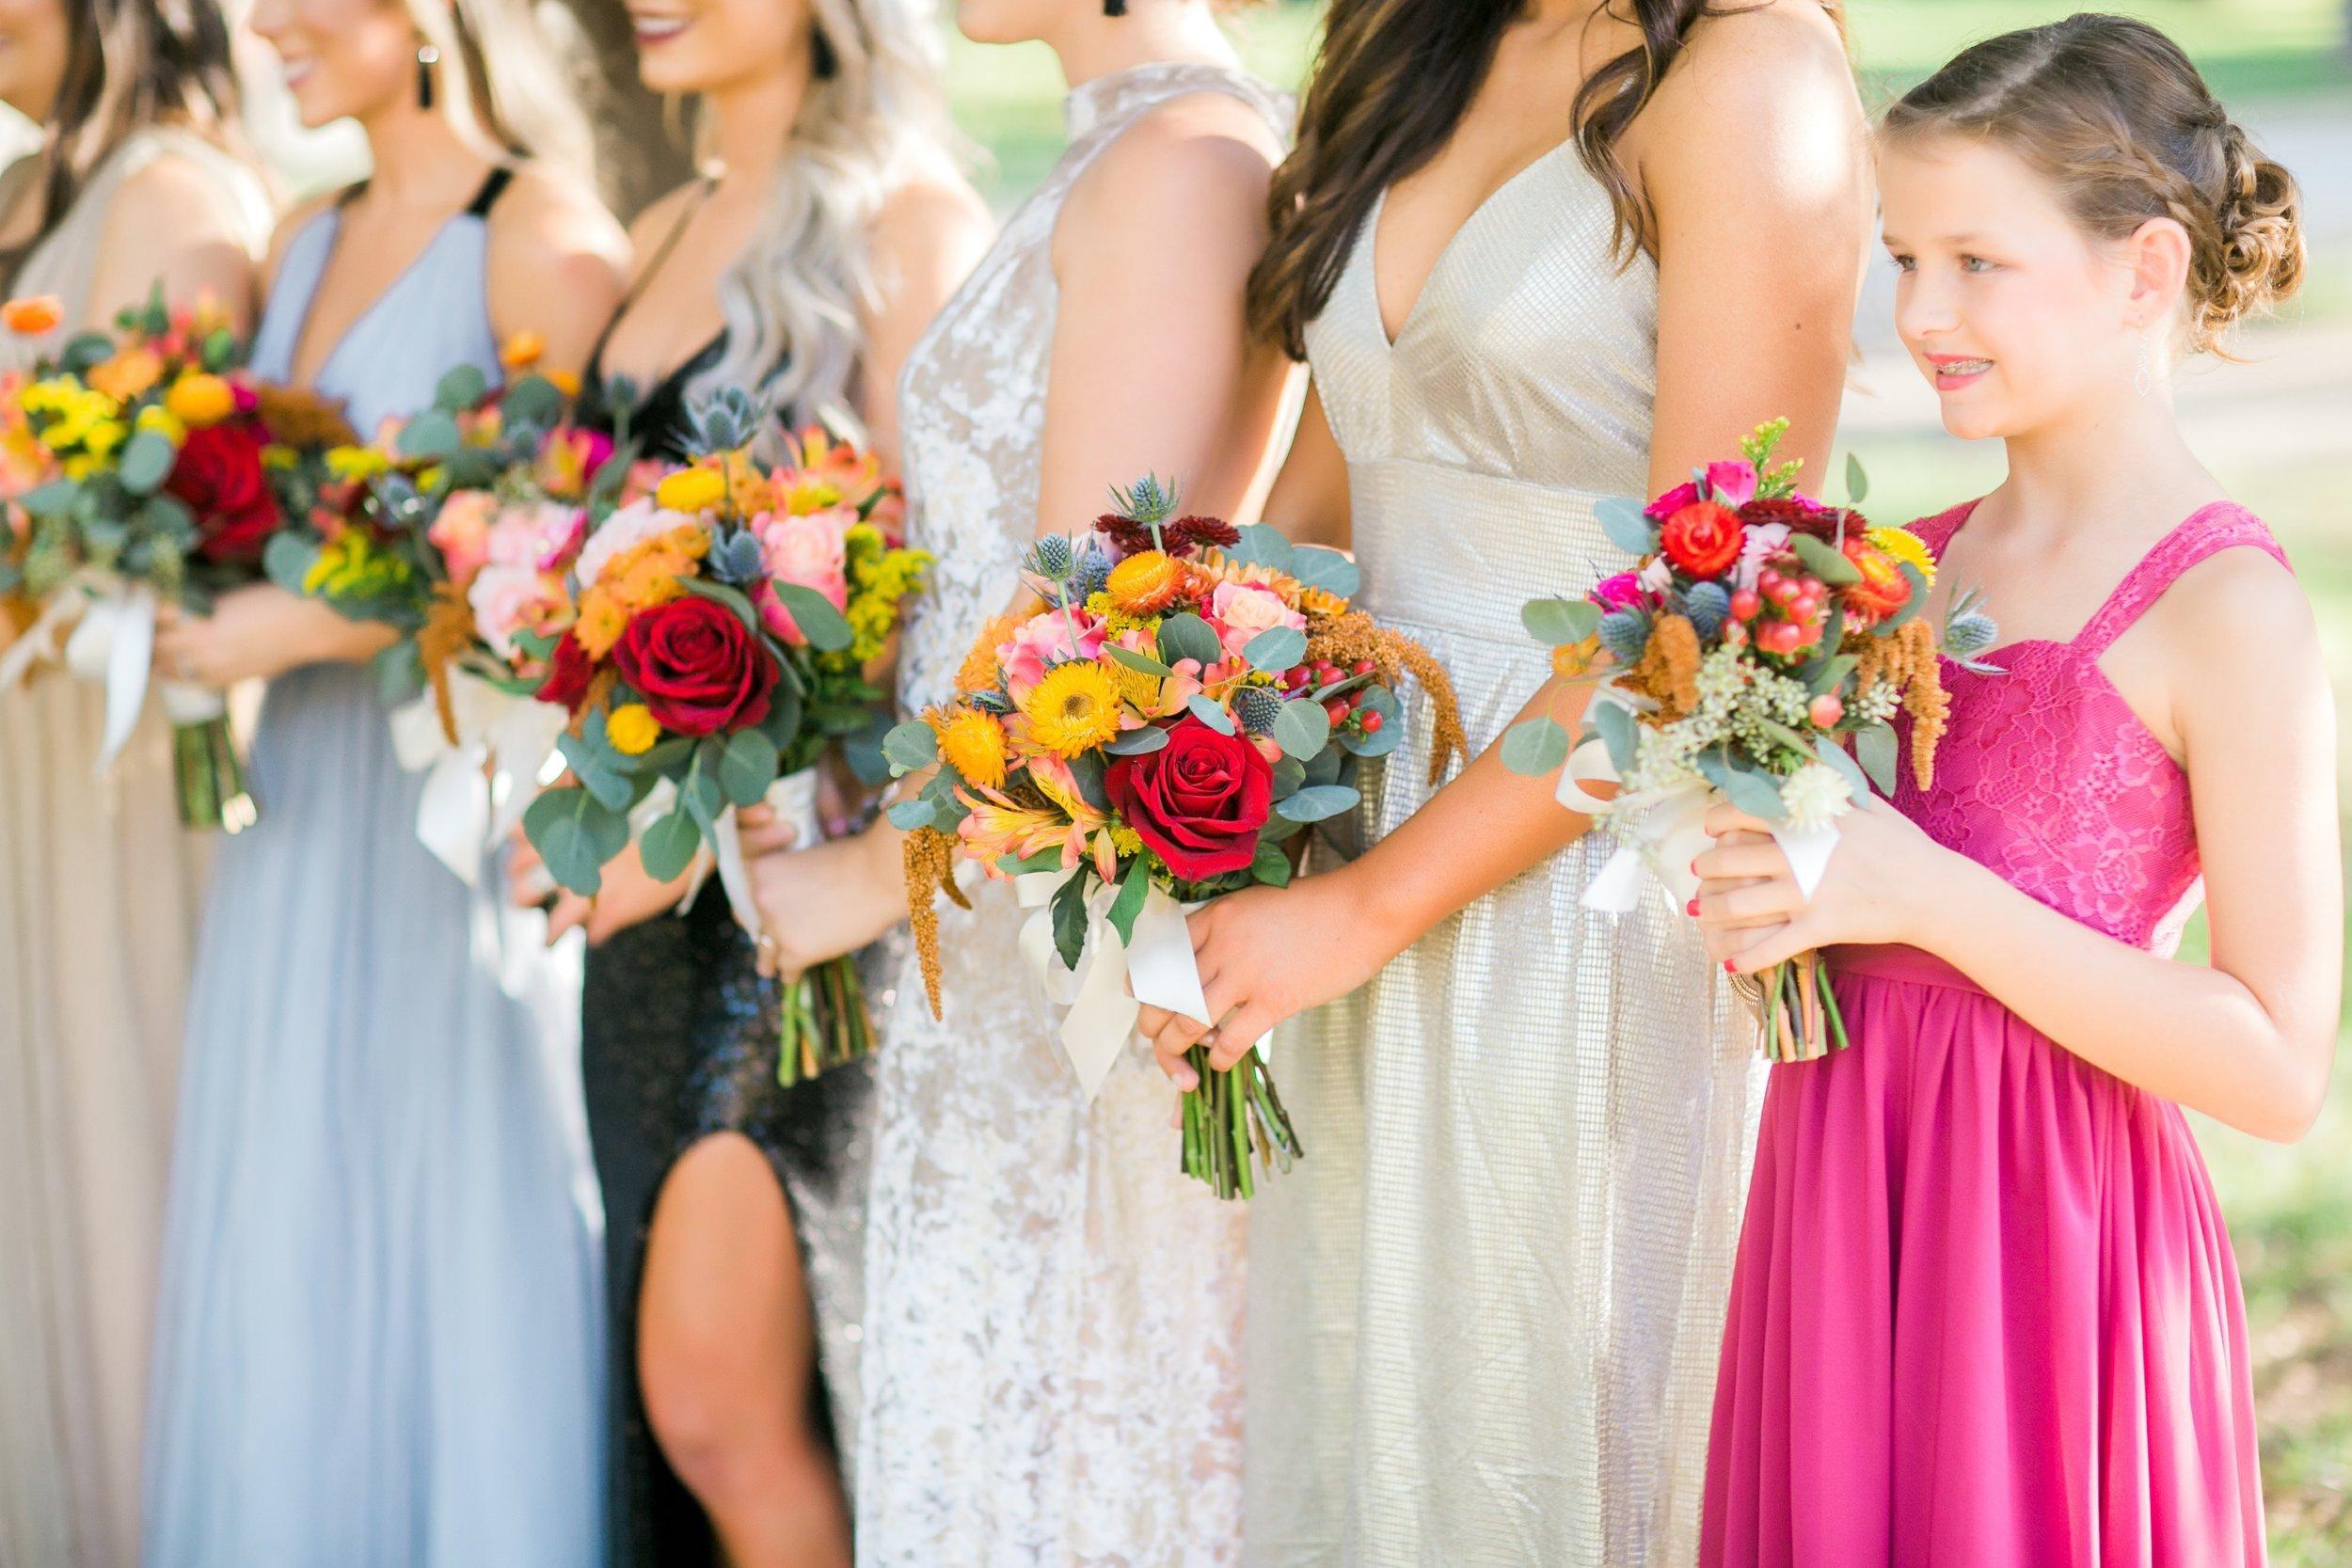 Roberson-Wedding-The-Forum-Lauren-Pinson-Wedding-Photography-Wichita-Falls-Texas-058.jpg